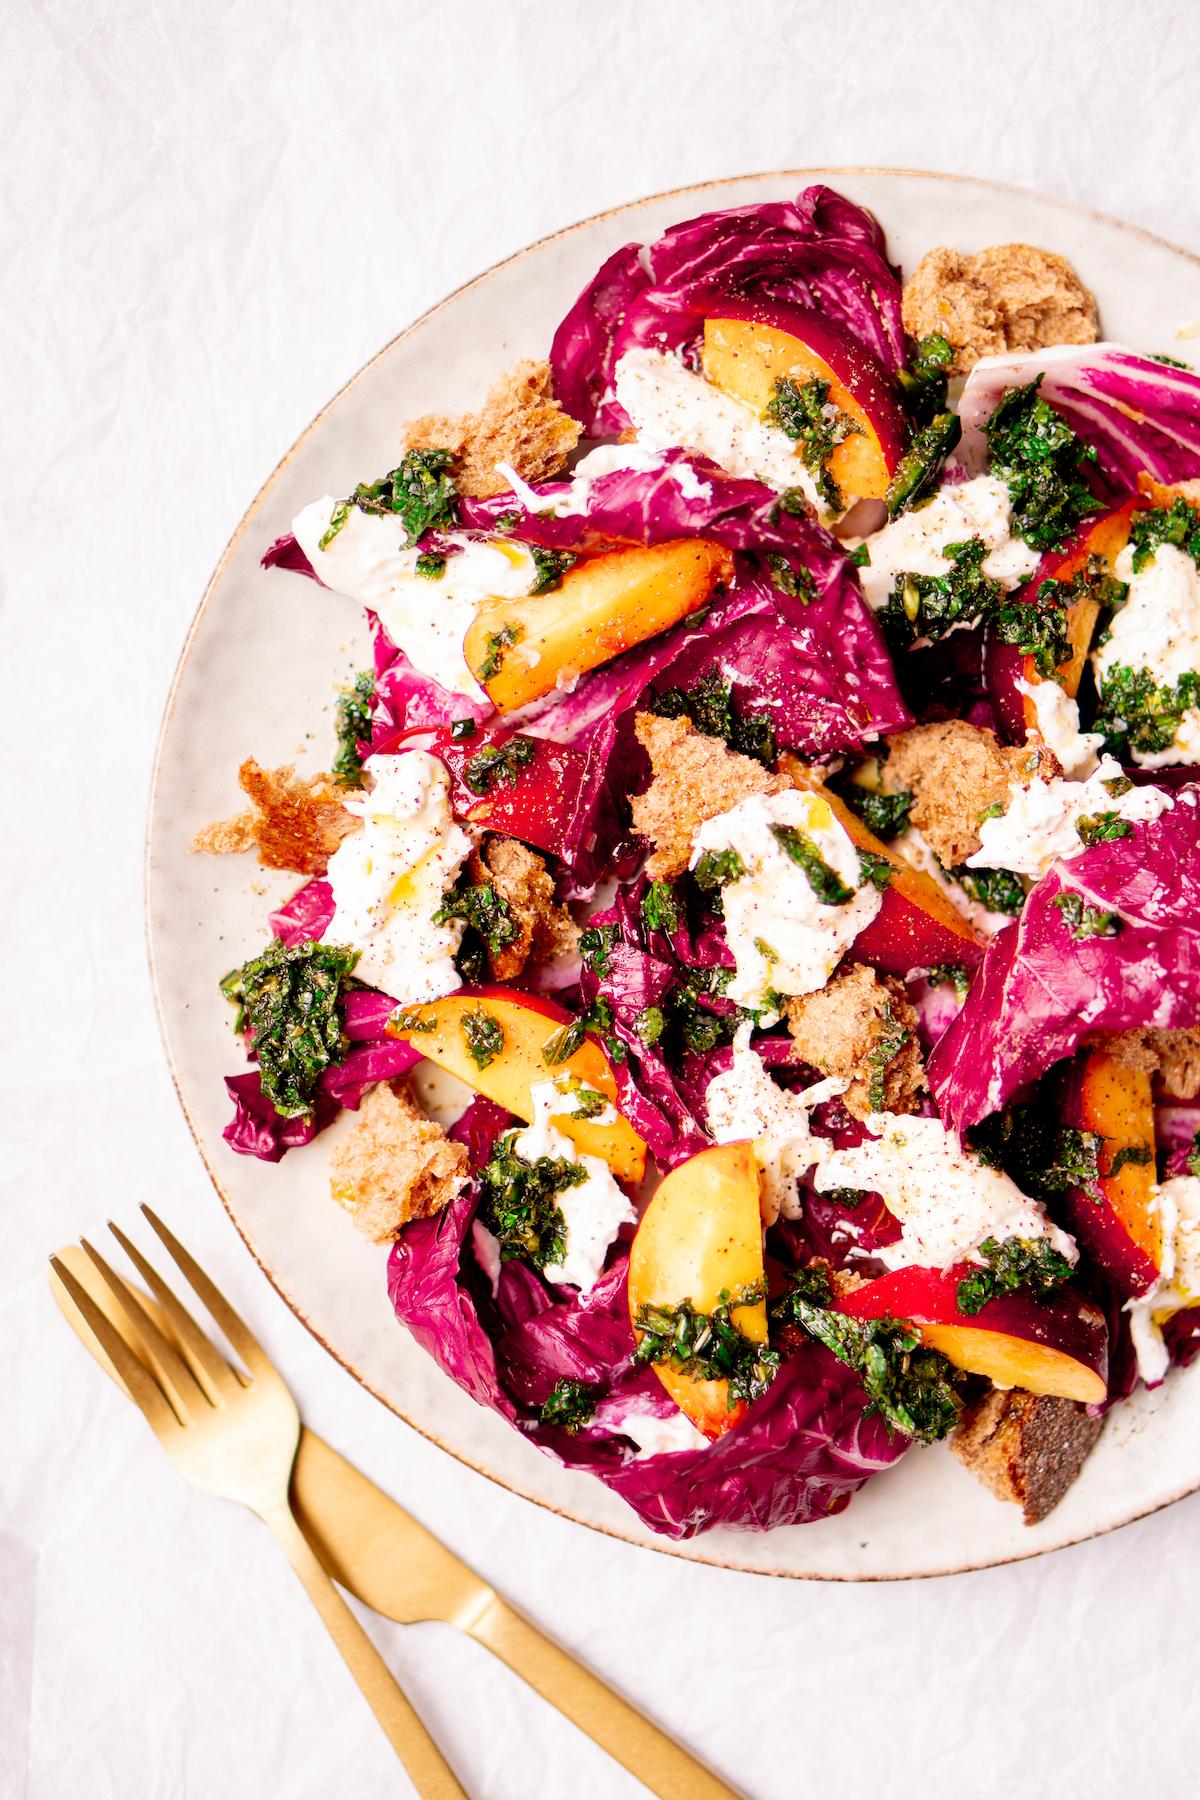 salade als lunch om thuis te werken